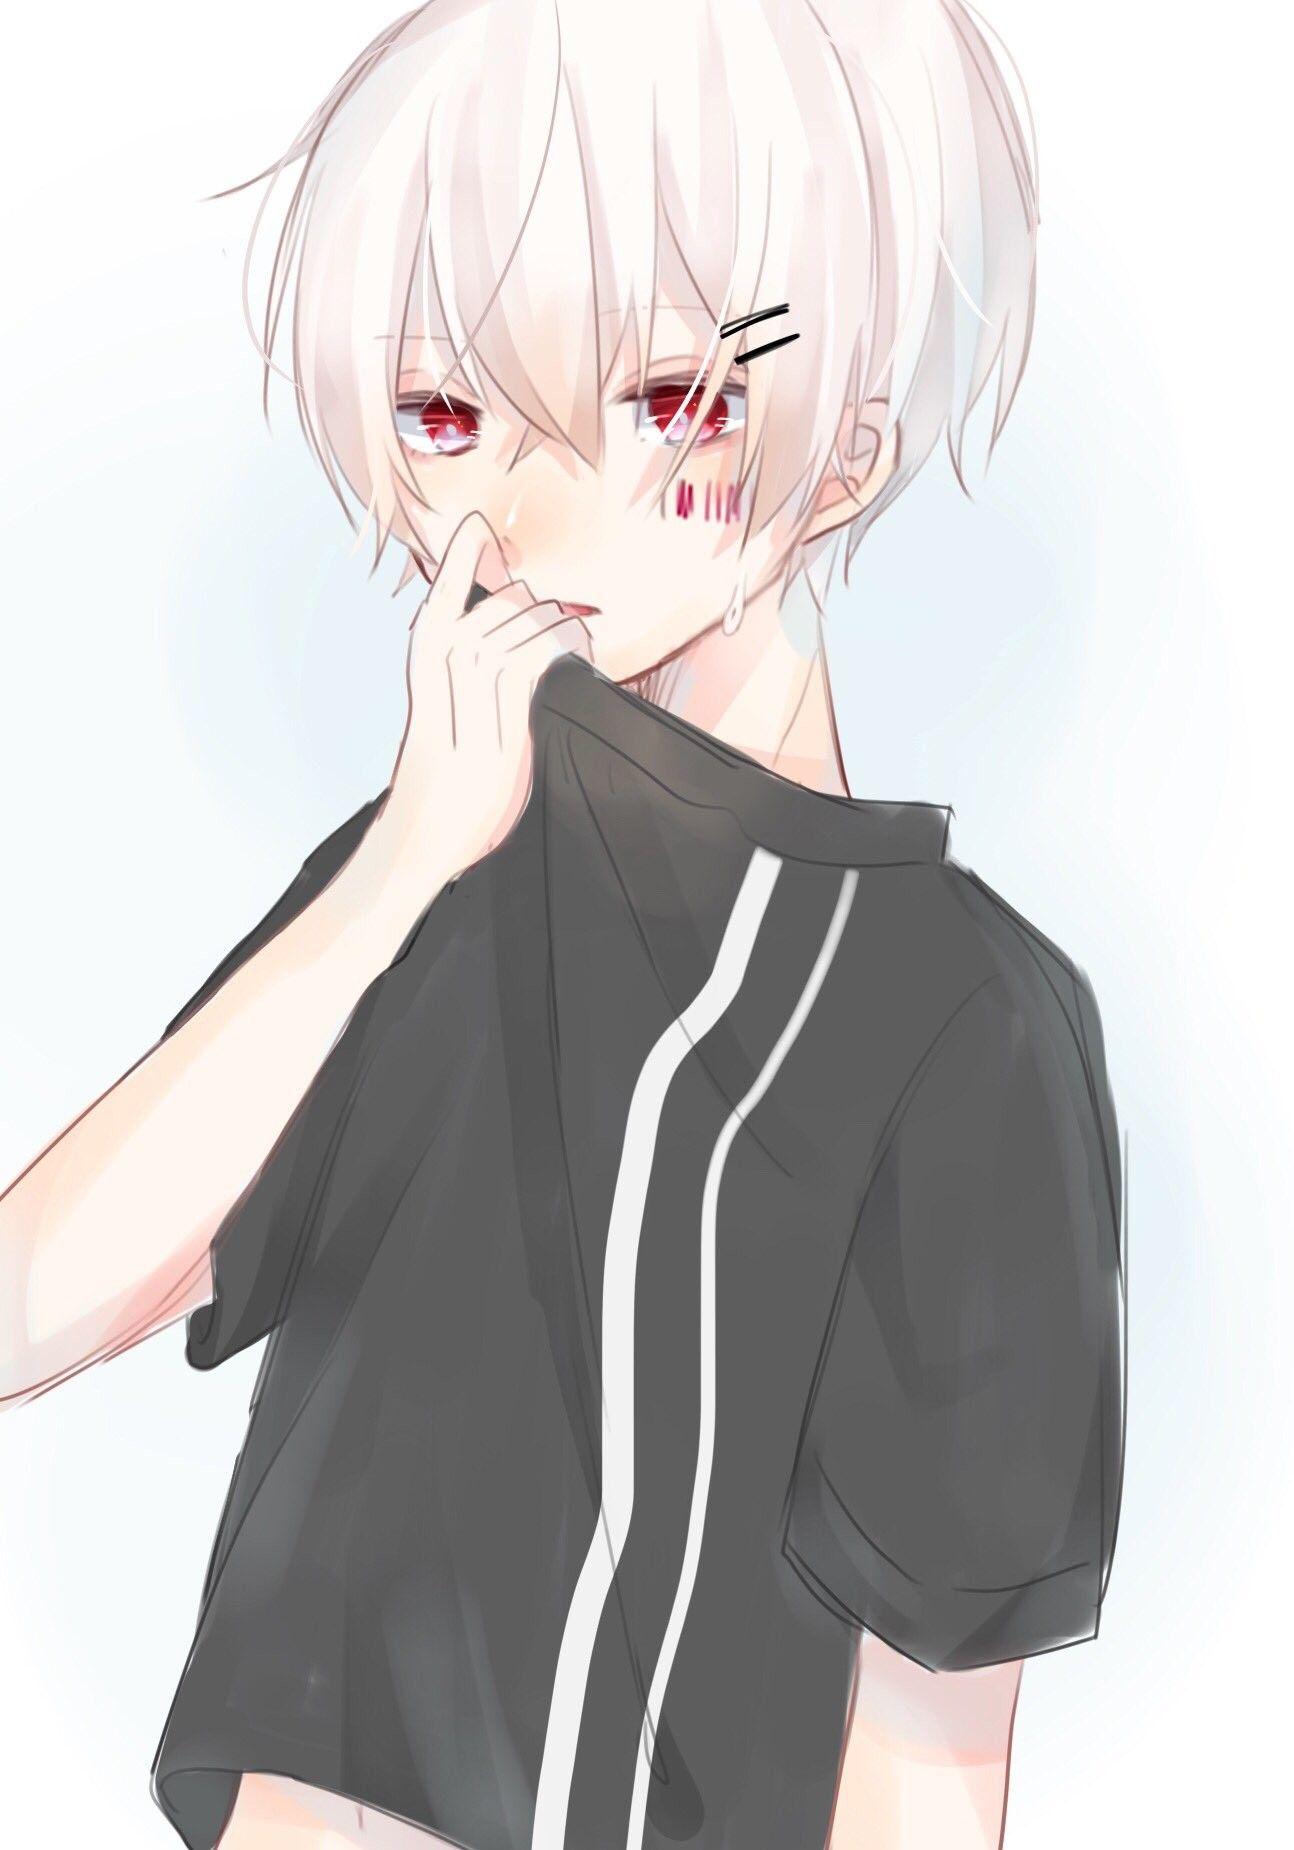 Pin by 春 Haru on anime boys Anime wallpaper phone